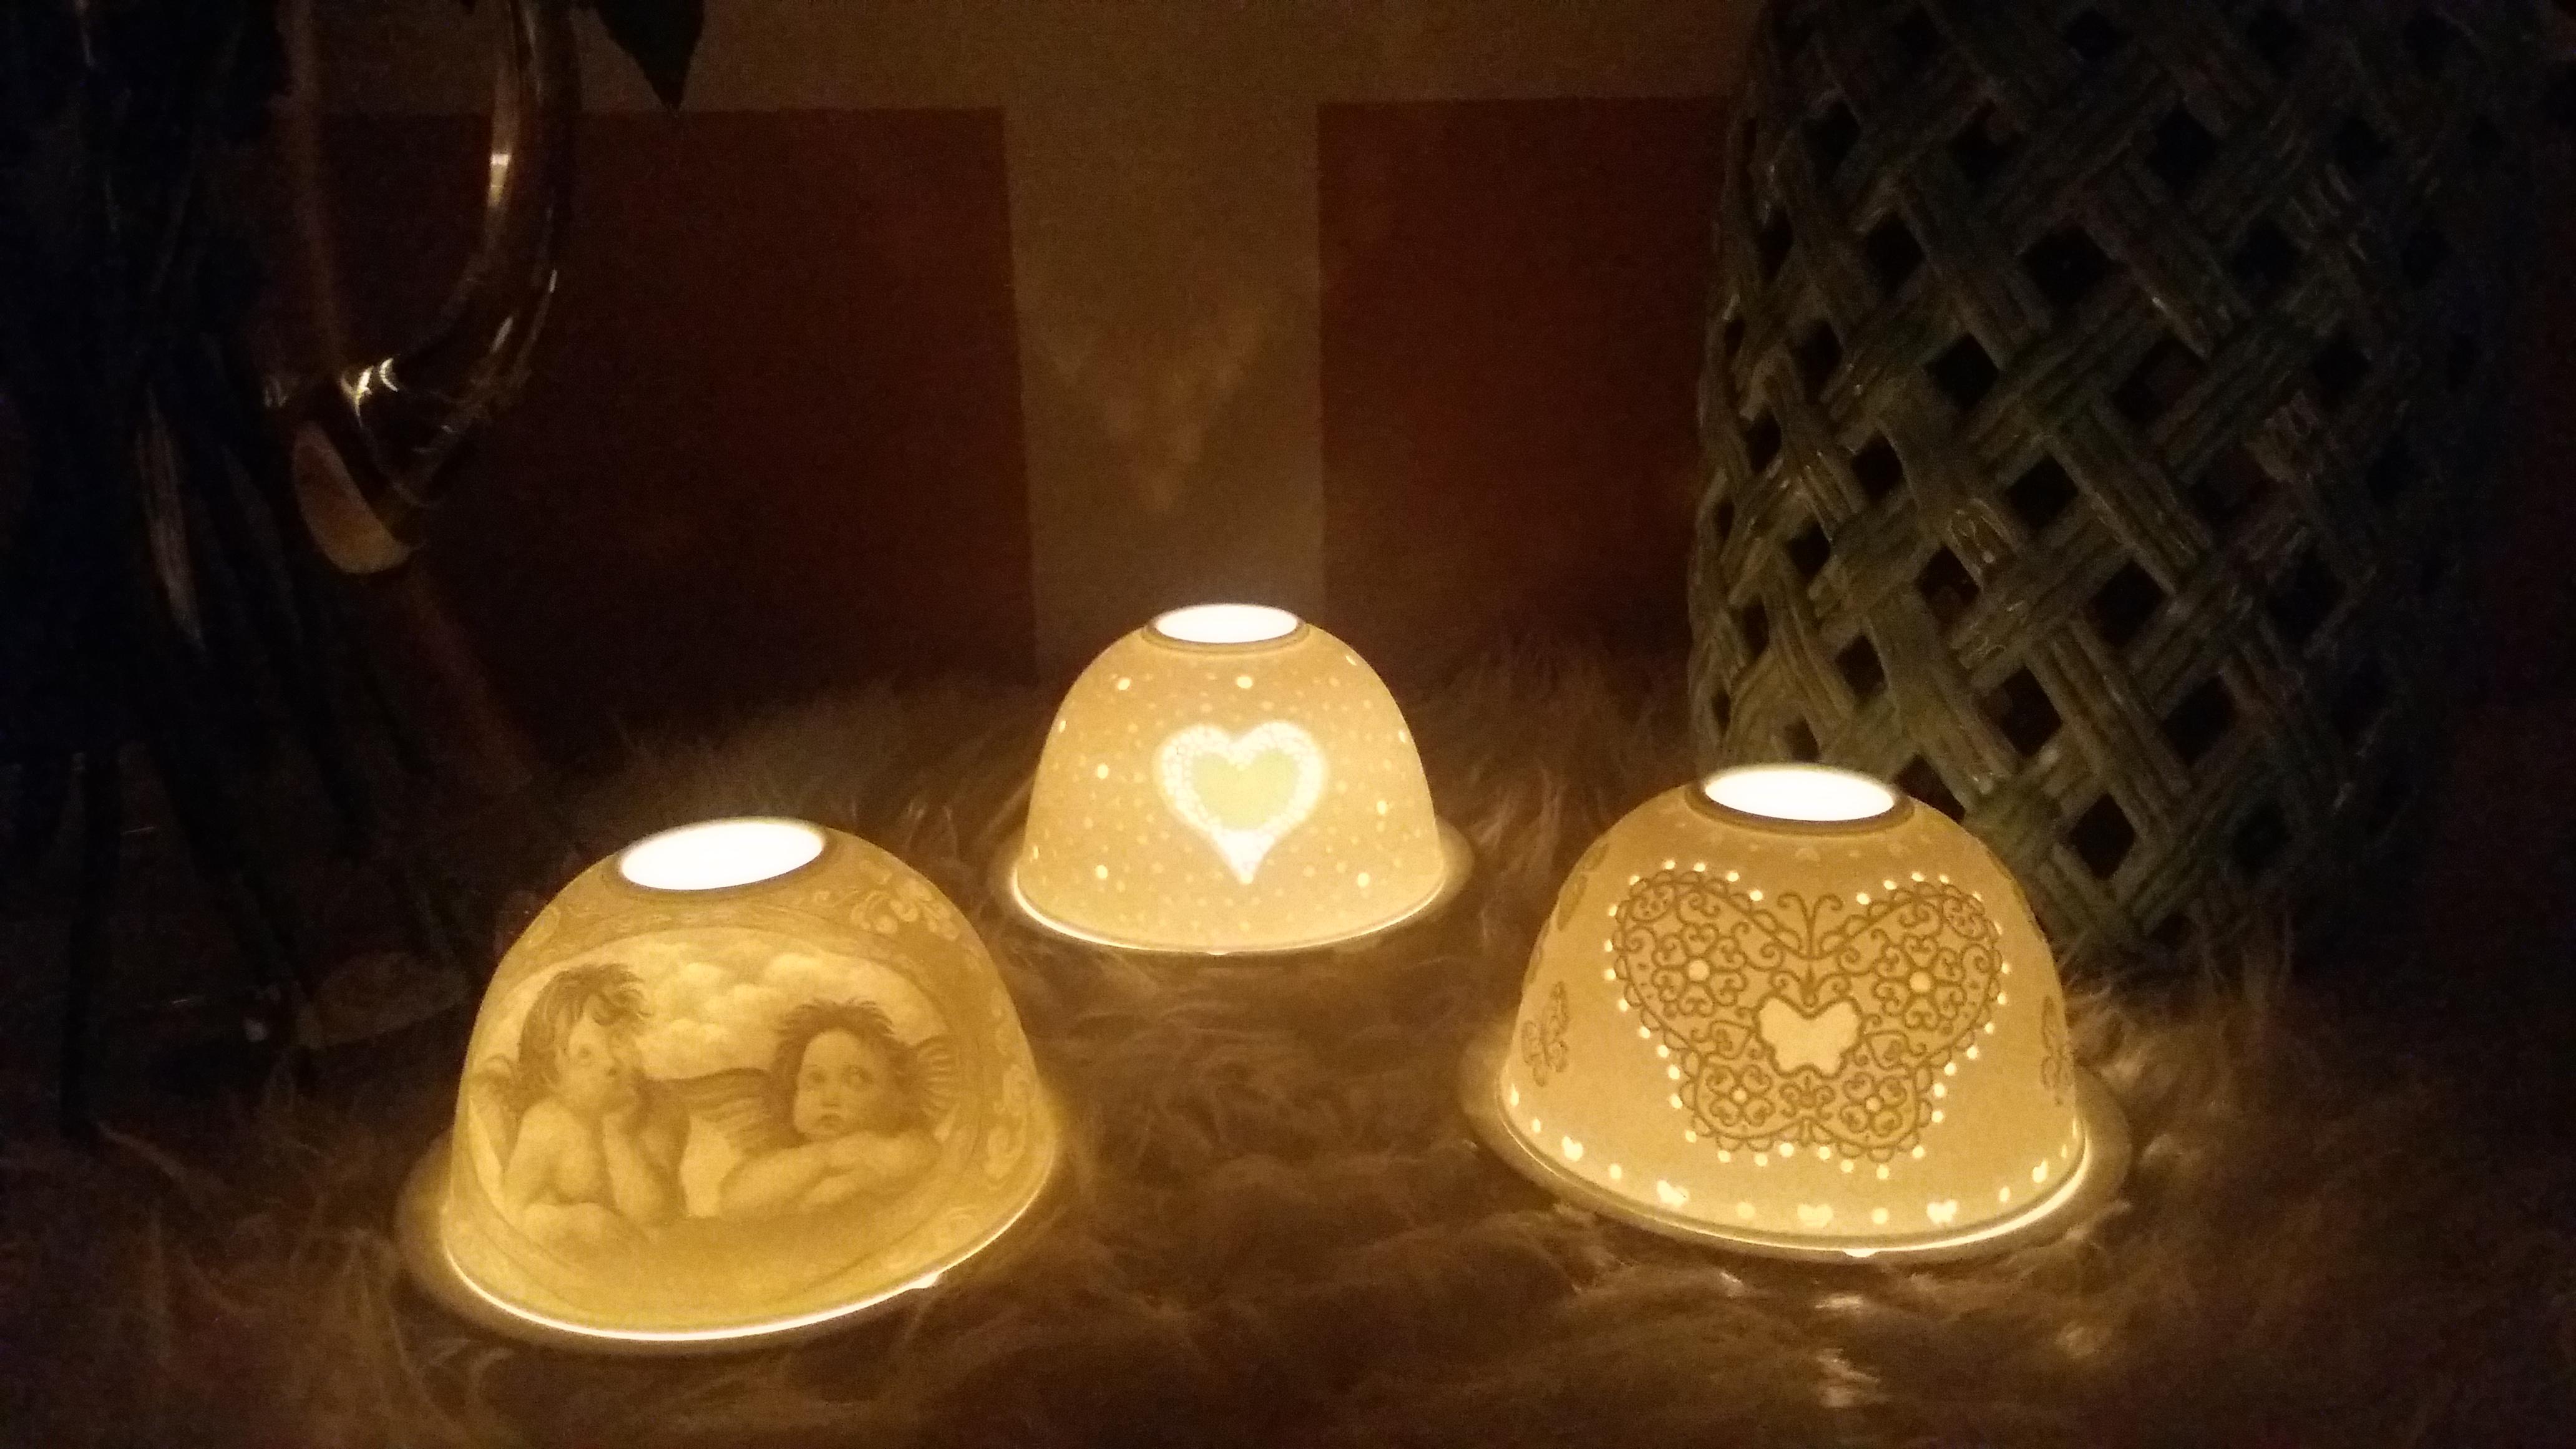 c60151c52 Svietniky, lampáše, lampy | Keramický svietnik, anjelik | fridahome